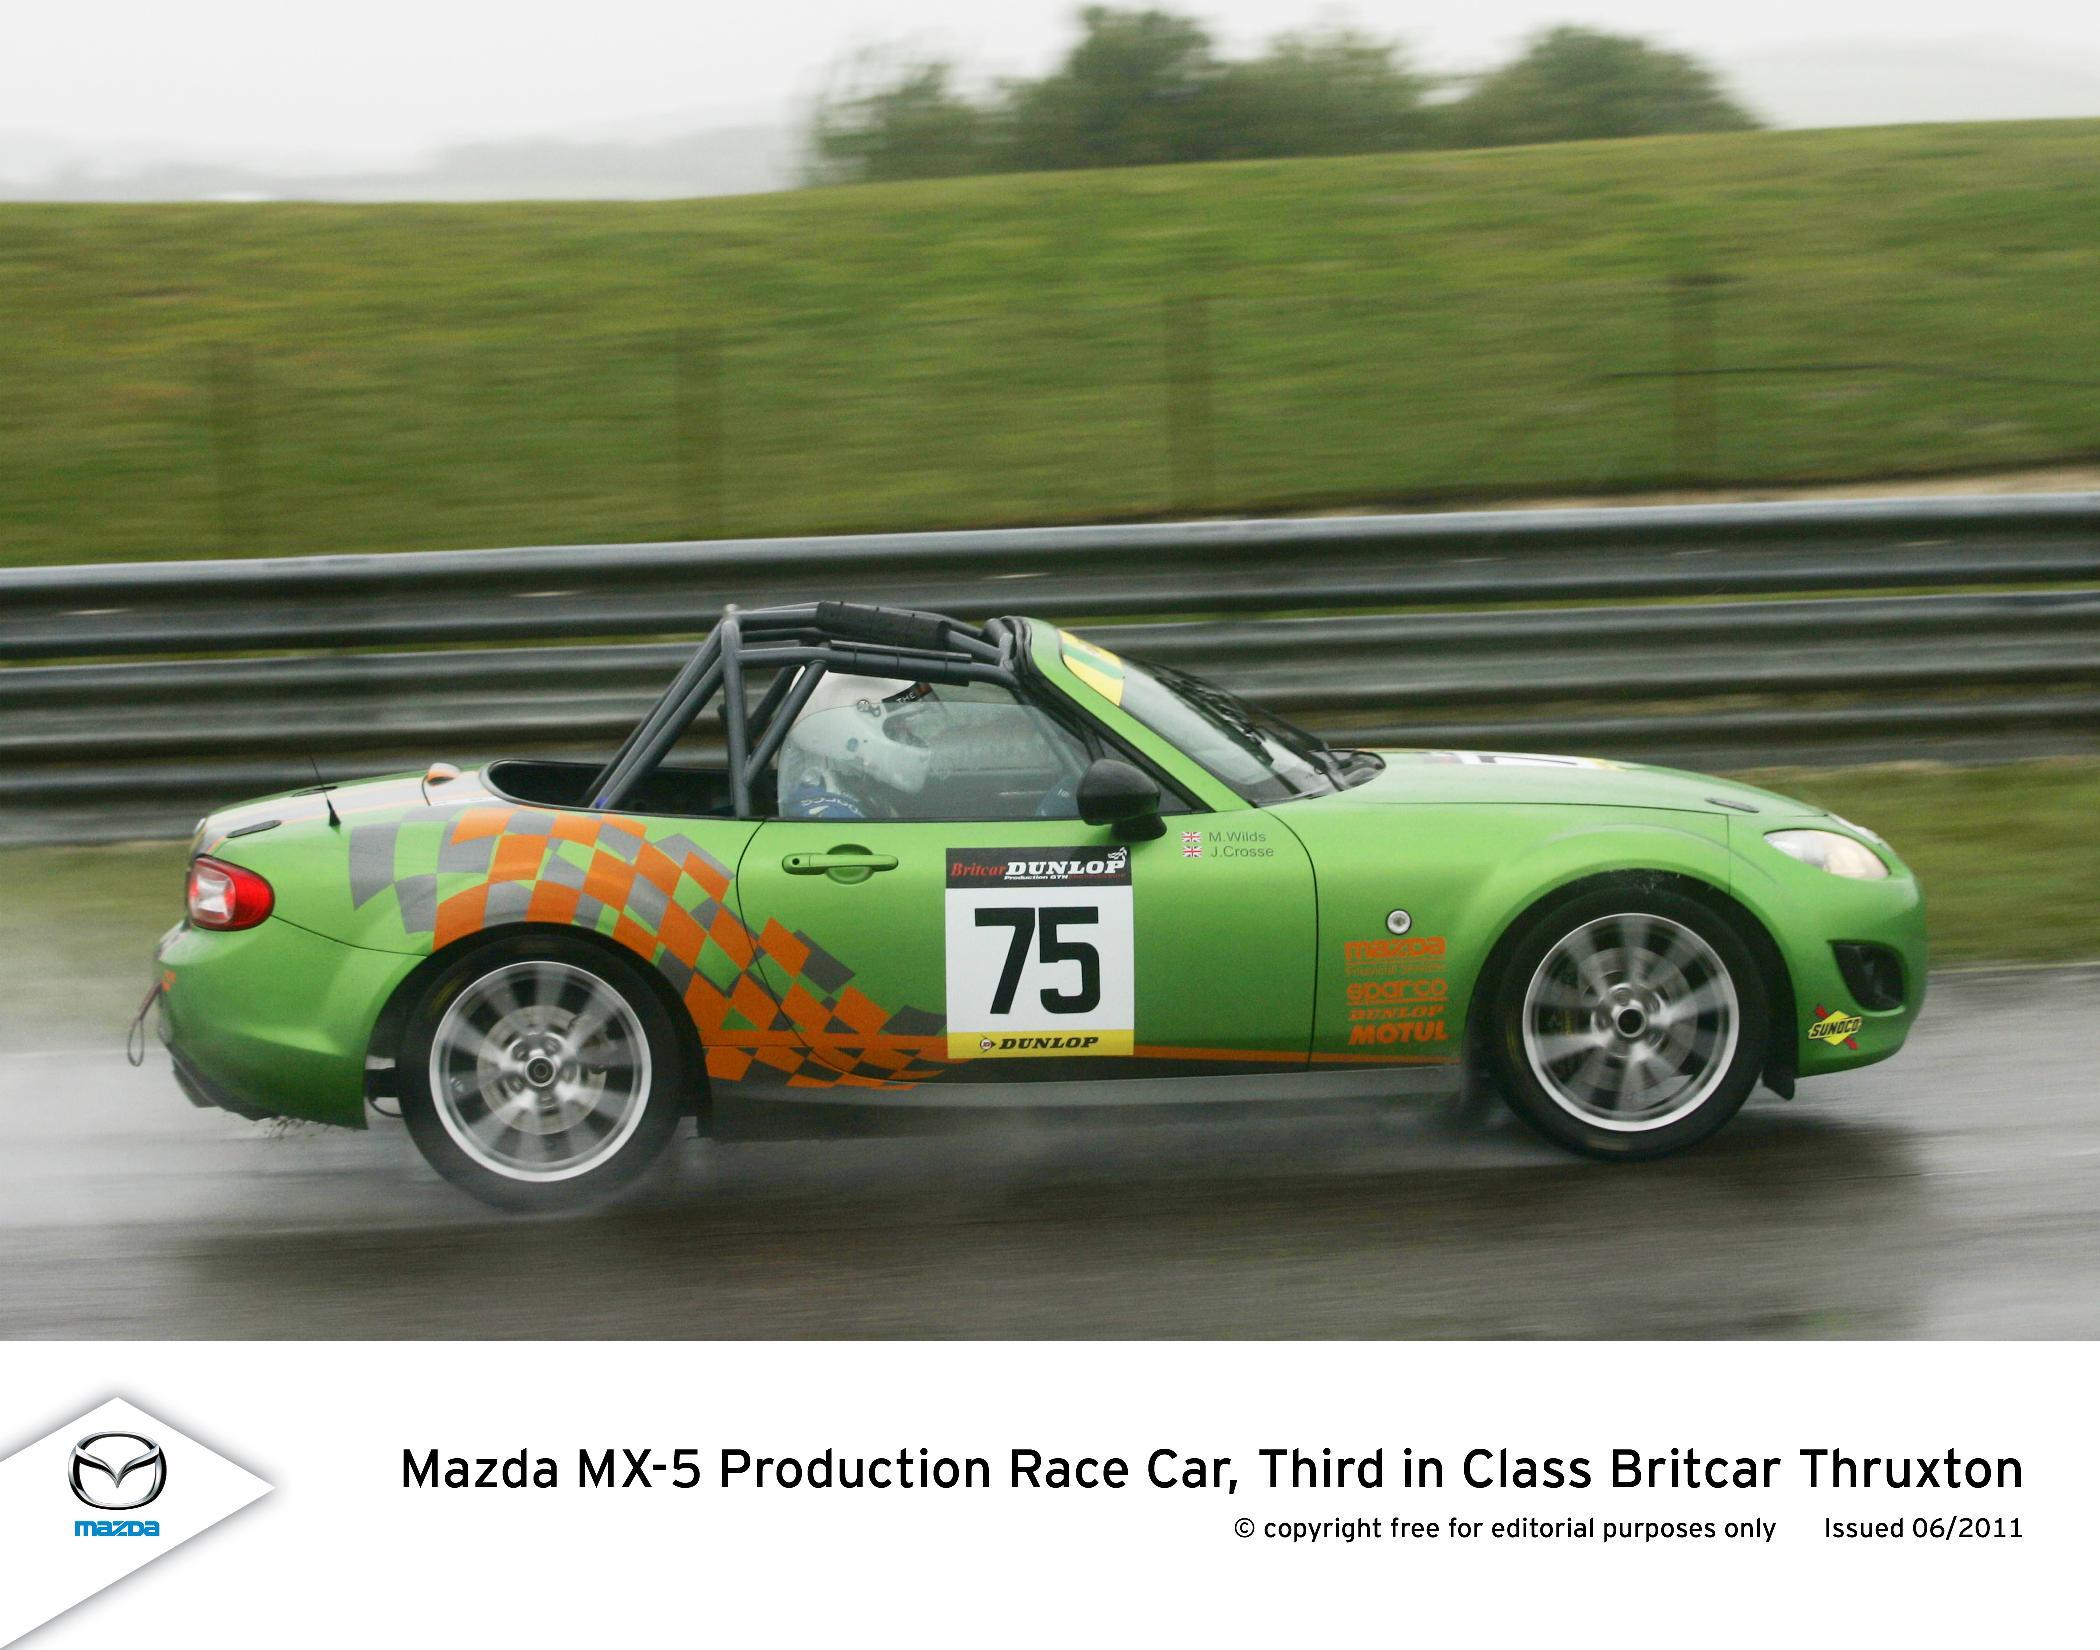 MAZDA 1 green